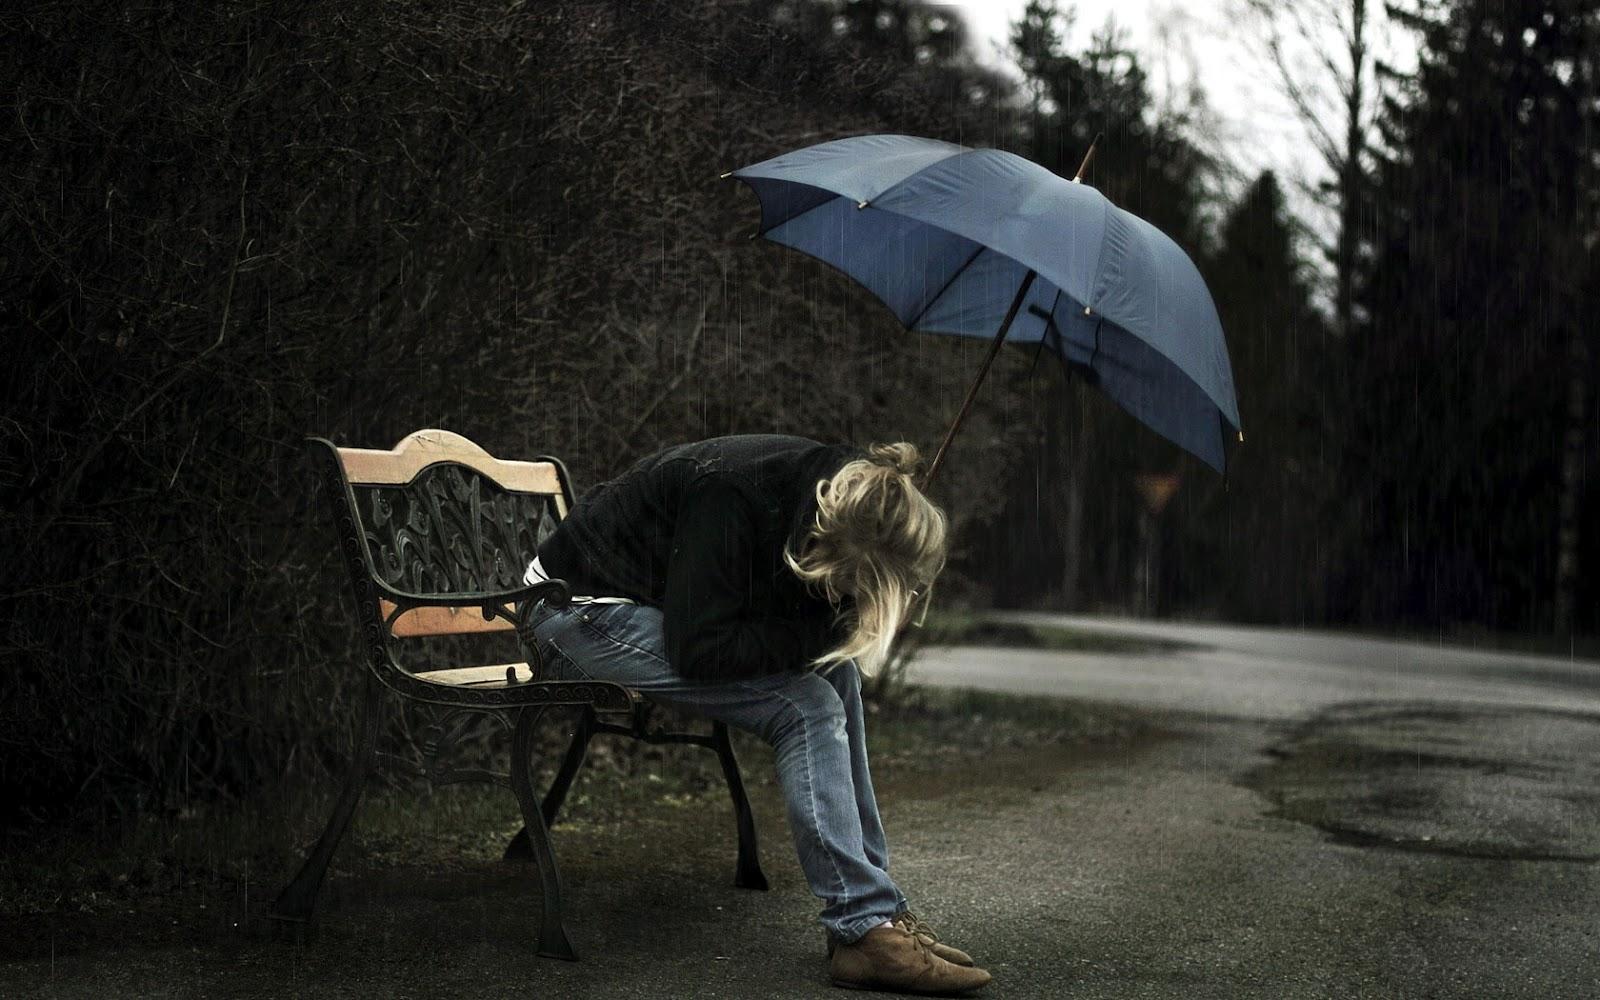 https://3.bp.blogspot.com/-7zNVjR3YhH0/T-loSlQ-NGI/AAAAAAAAAVc/4pyBwAUEVco/s1600/mised+download+free+rain+wallpaper+hd+for+desktop.jpg